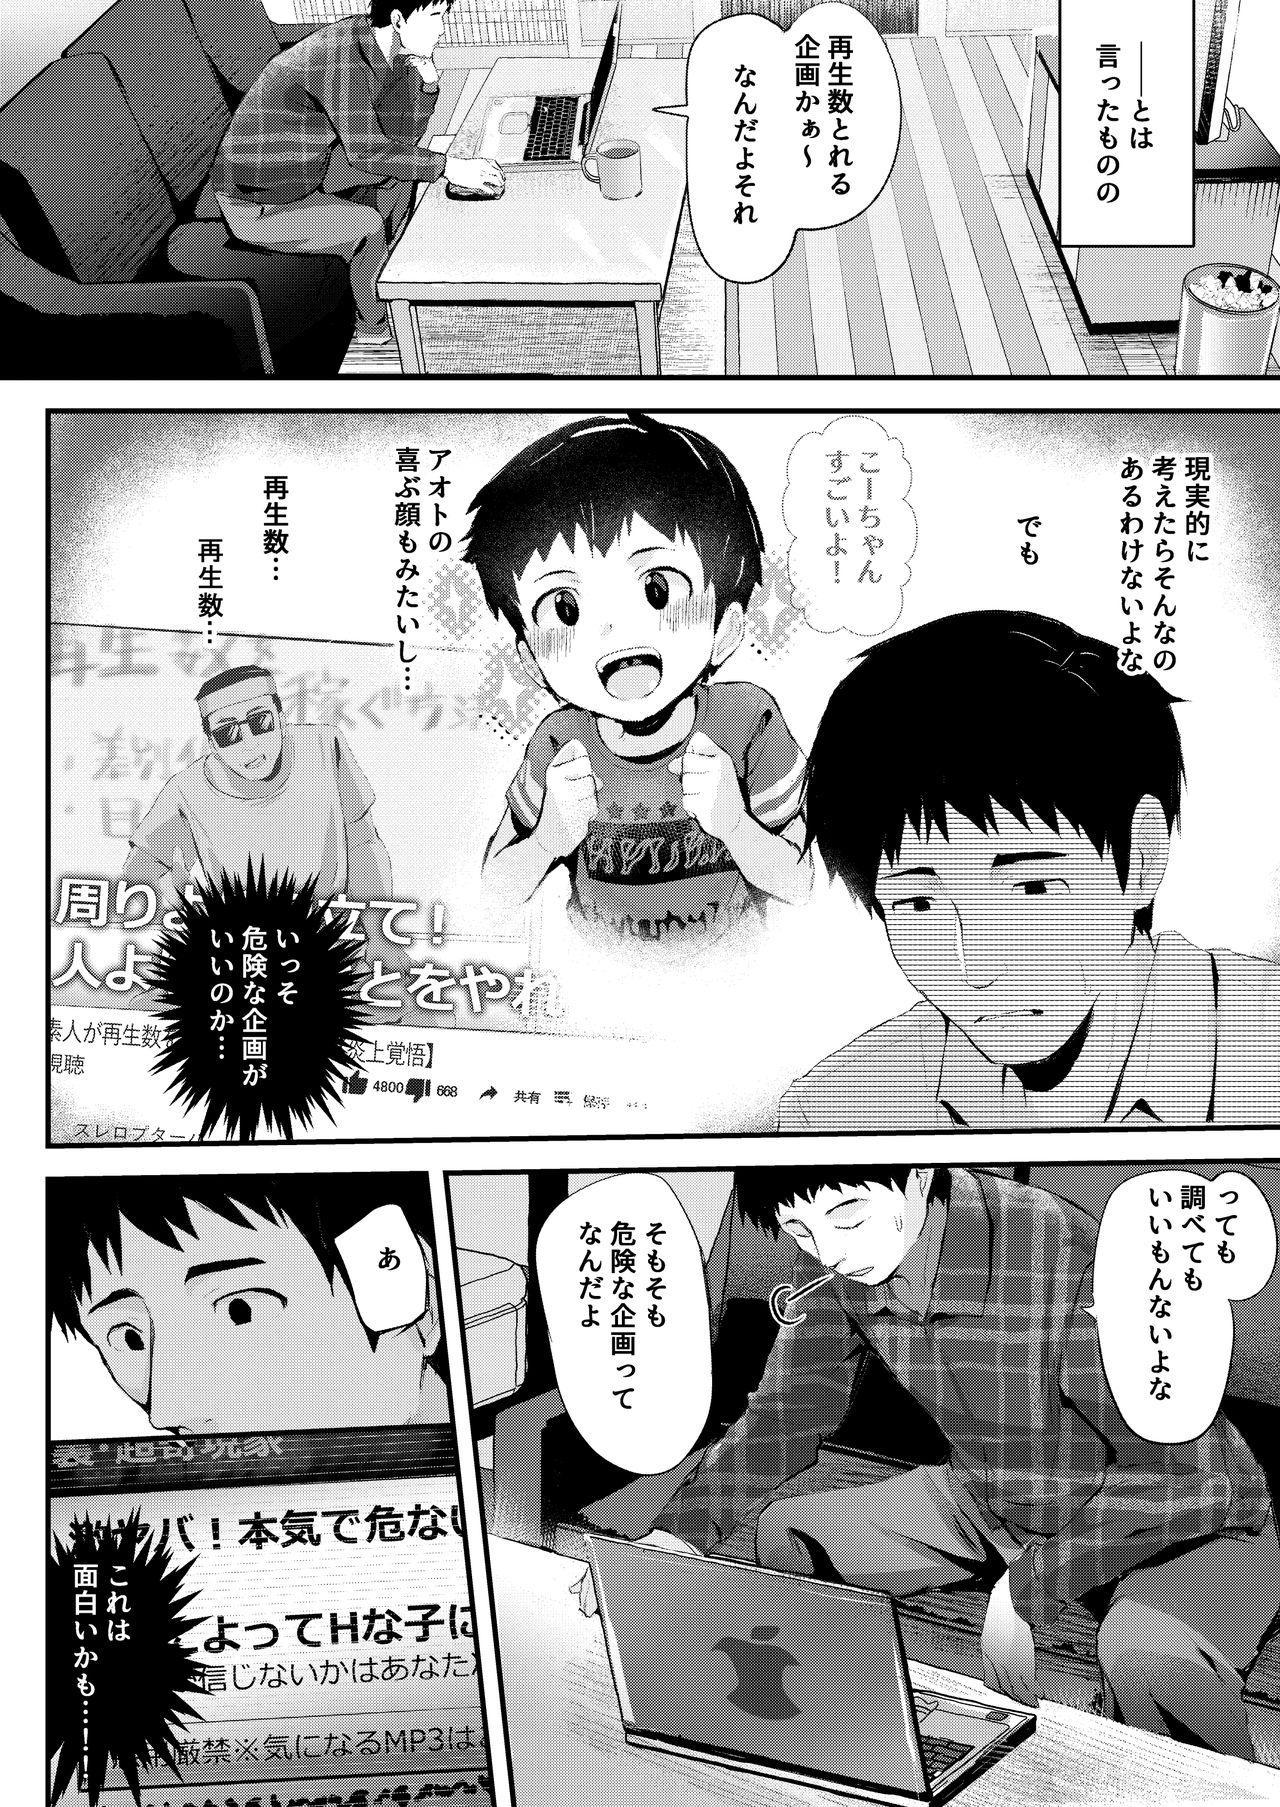 Dokidoki Dougazukuri! 4